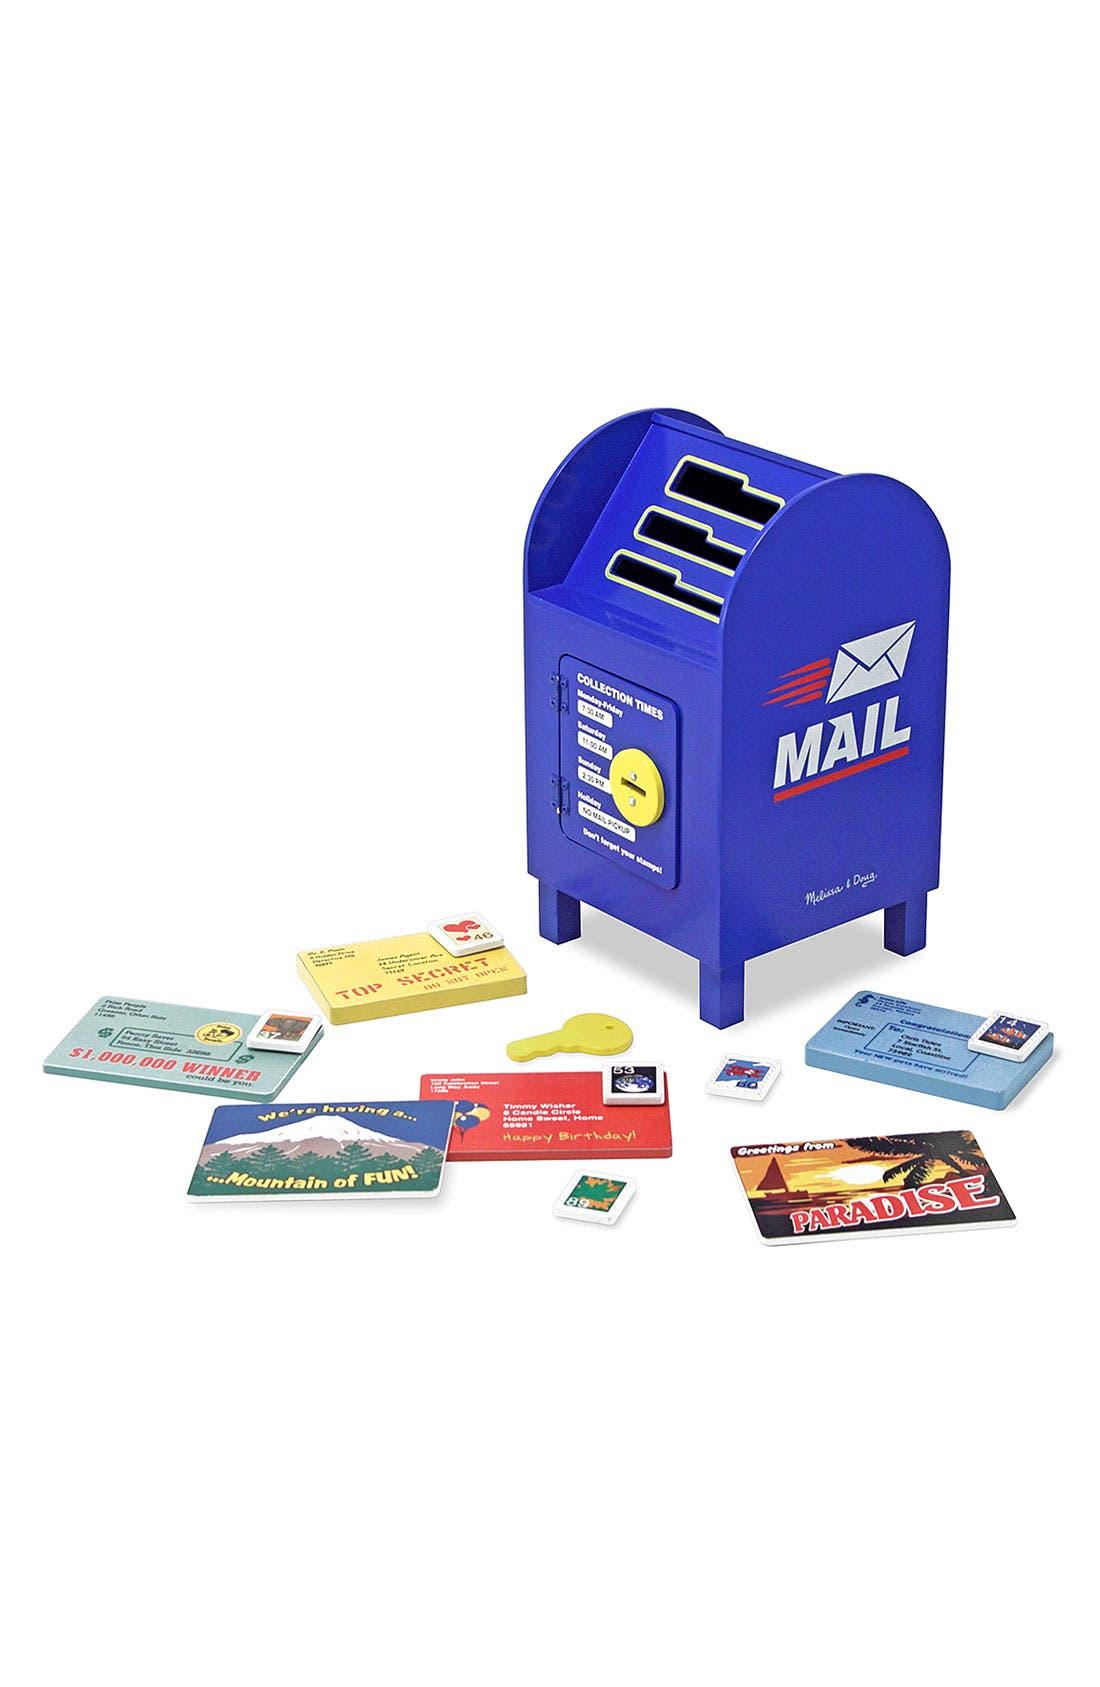 Melissa & Doug 'Stamp Sort' Mailbox